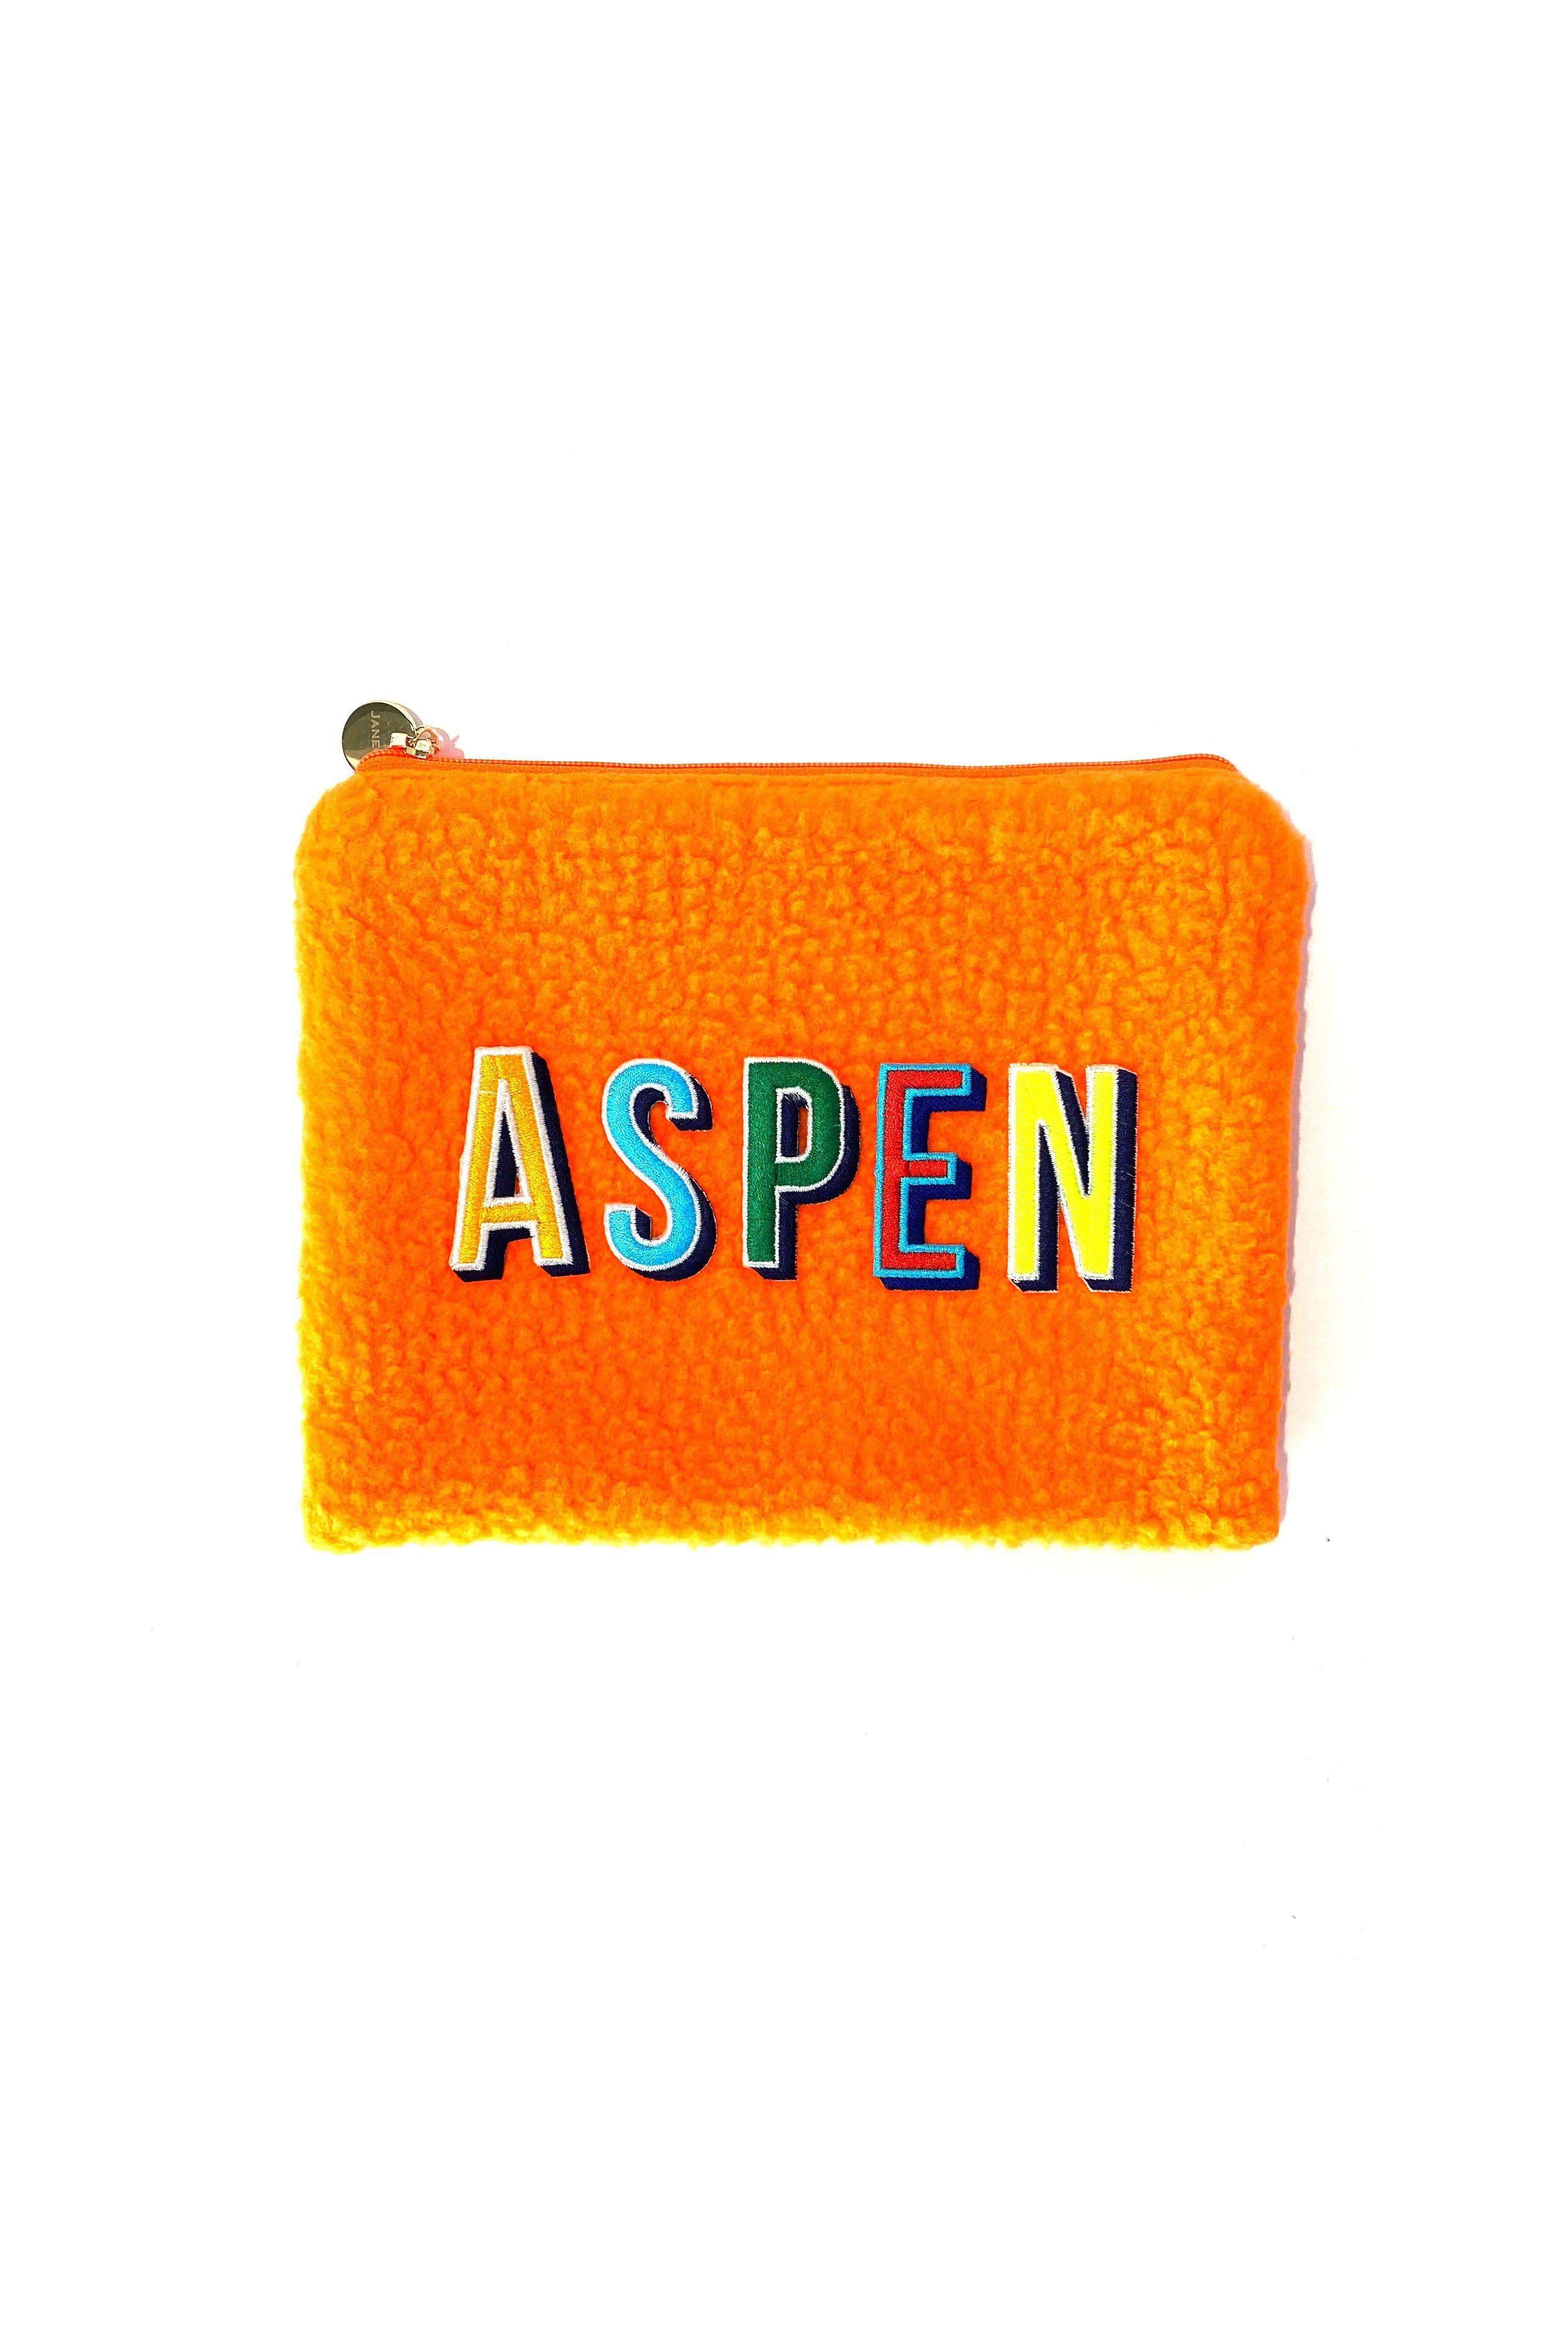 Aspen Make-up Beutel in Orange